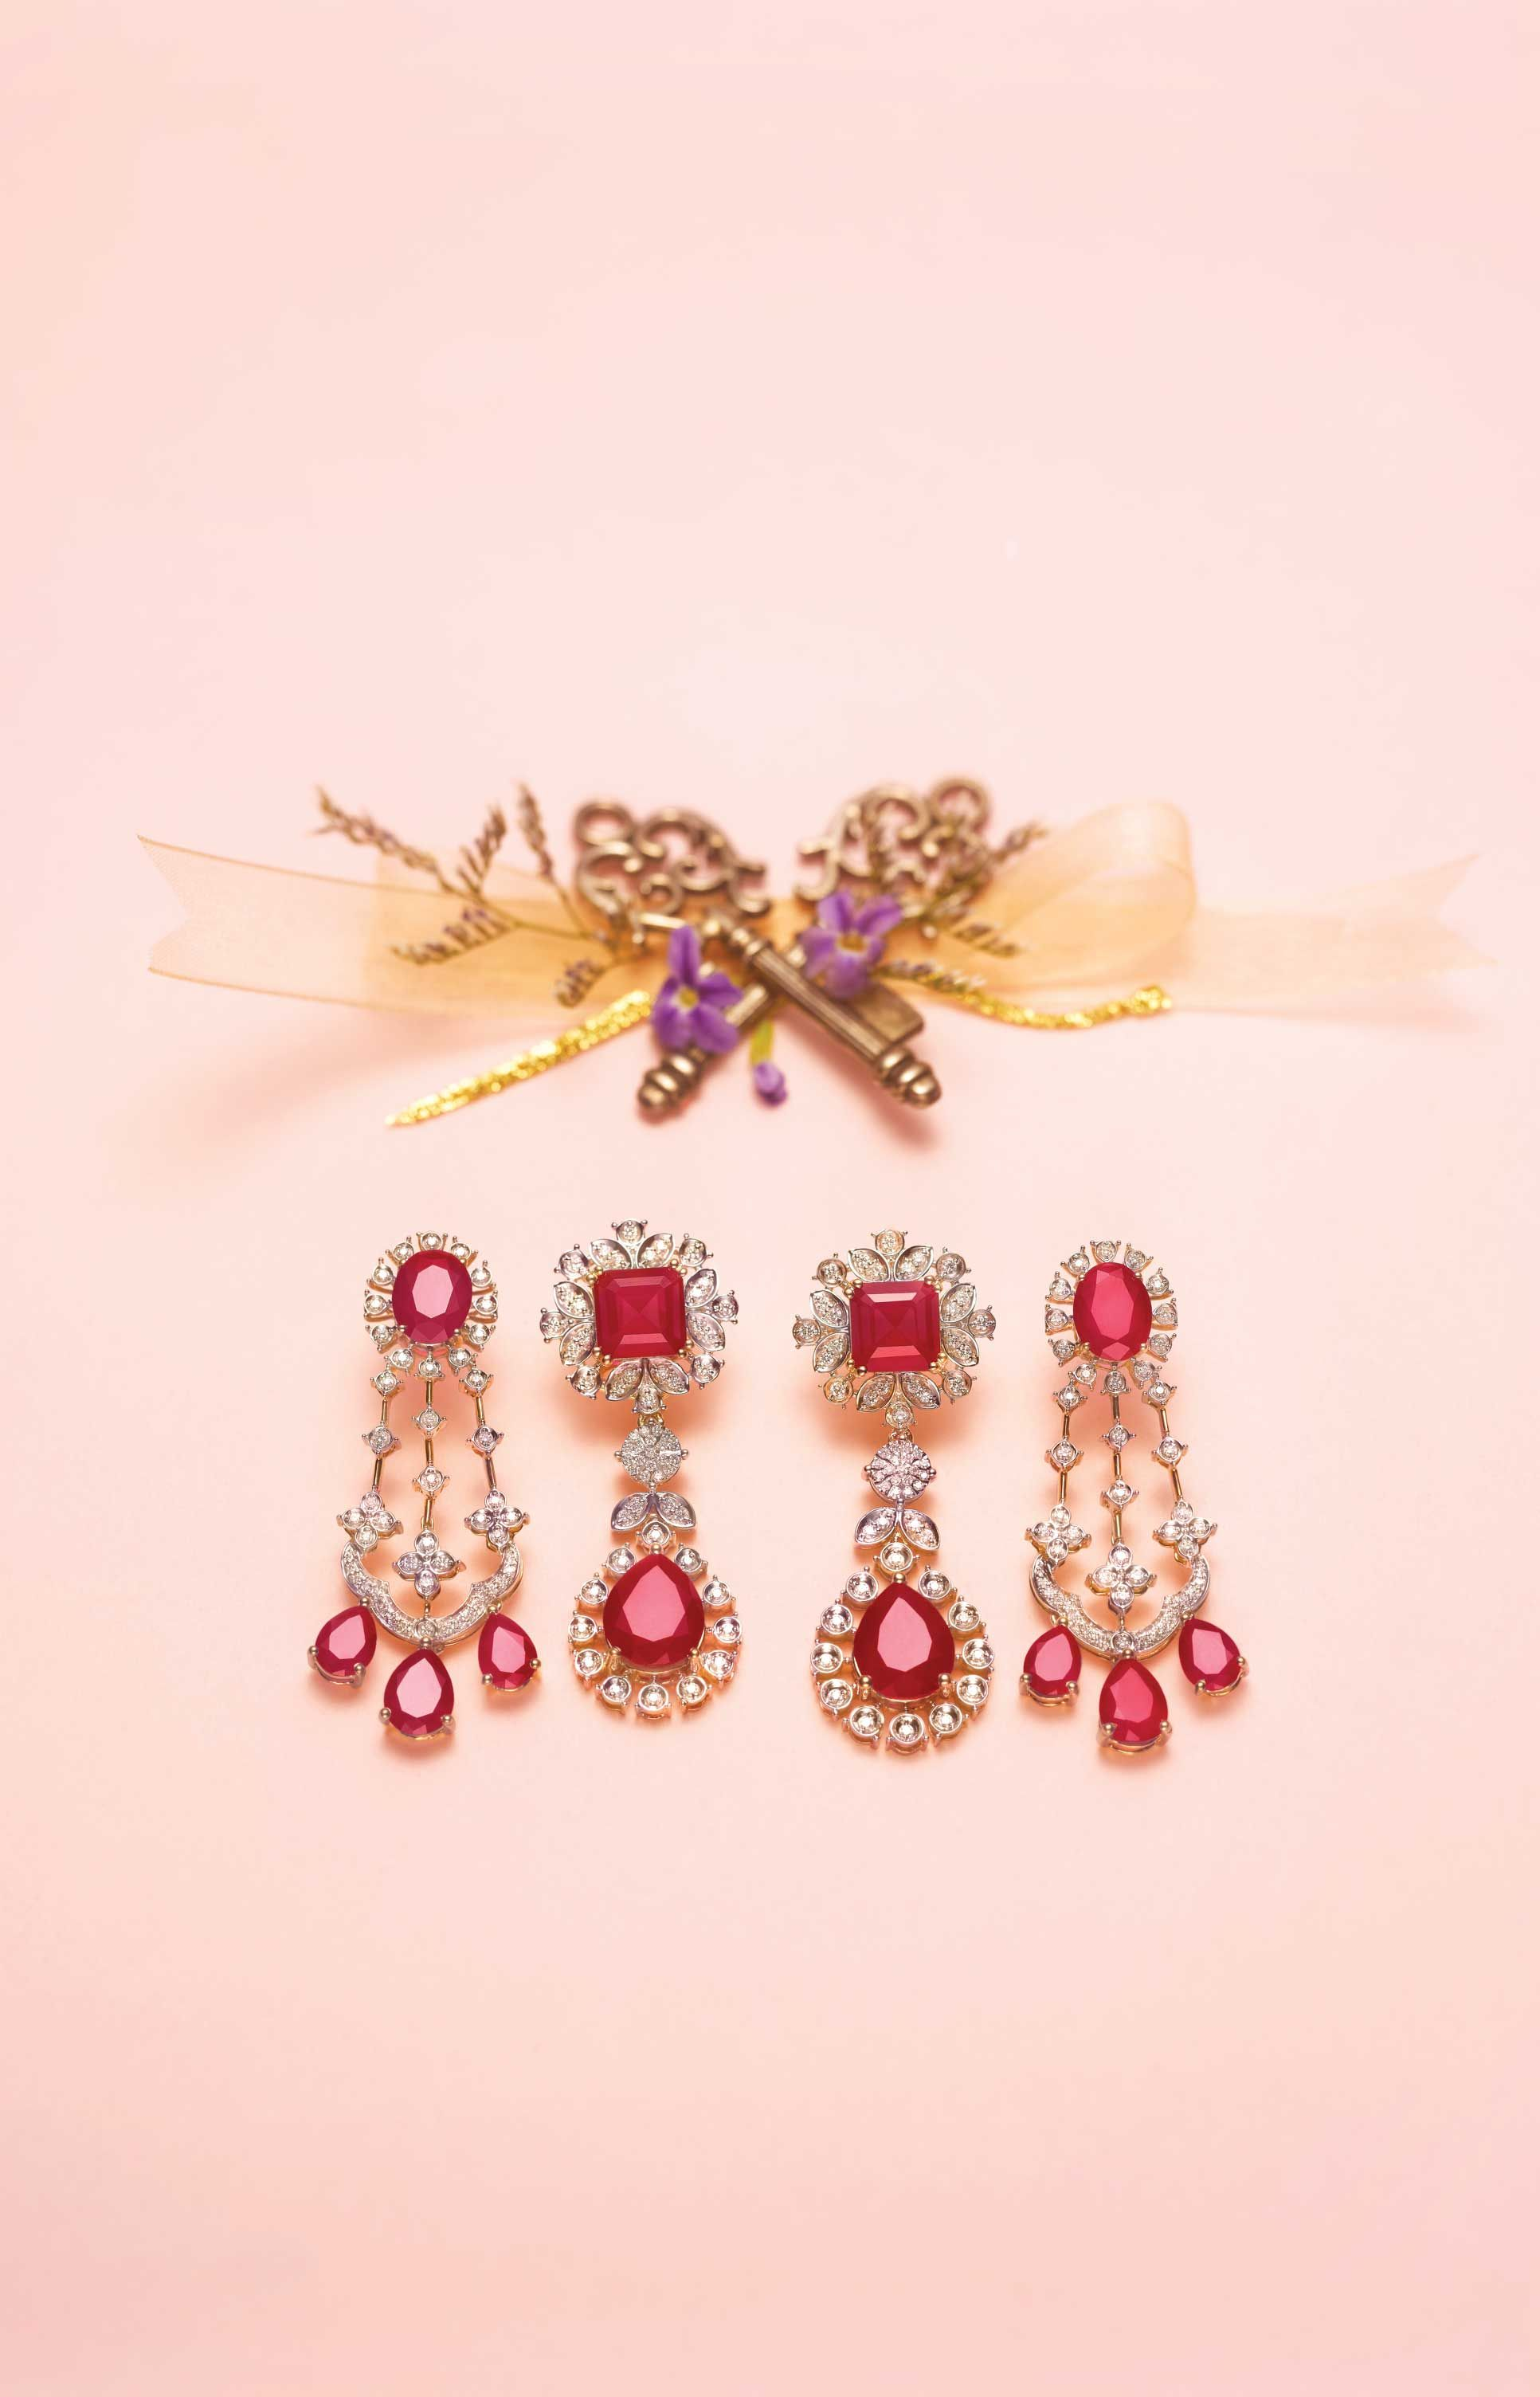 Tanishq jewelry | Earrings | Pinterest | Ear rings, Jewel and Diamond